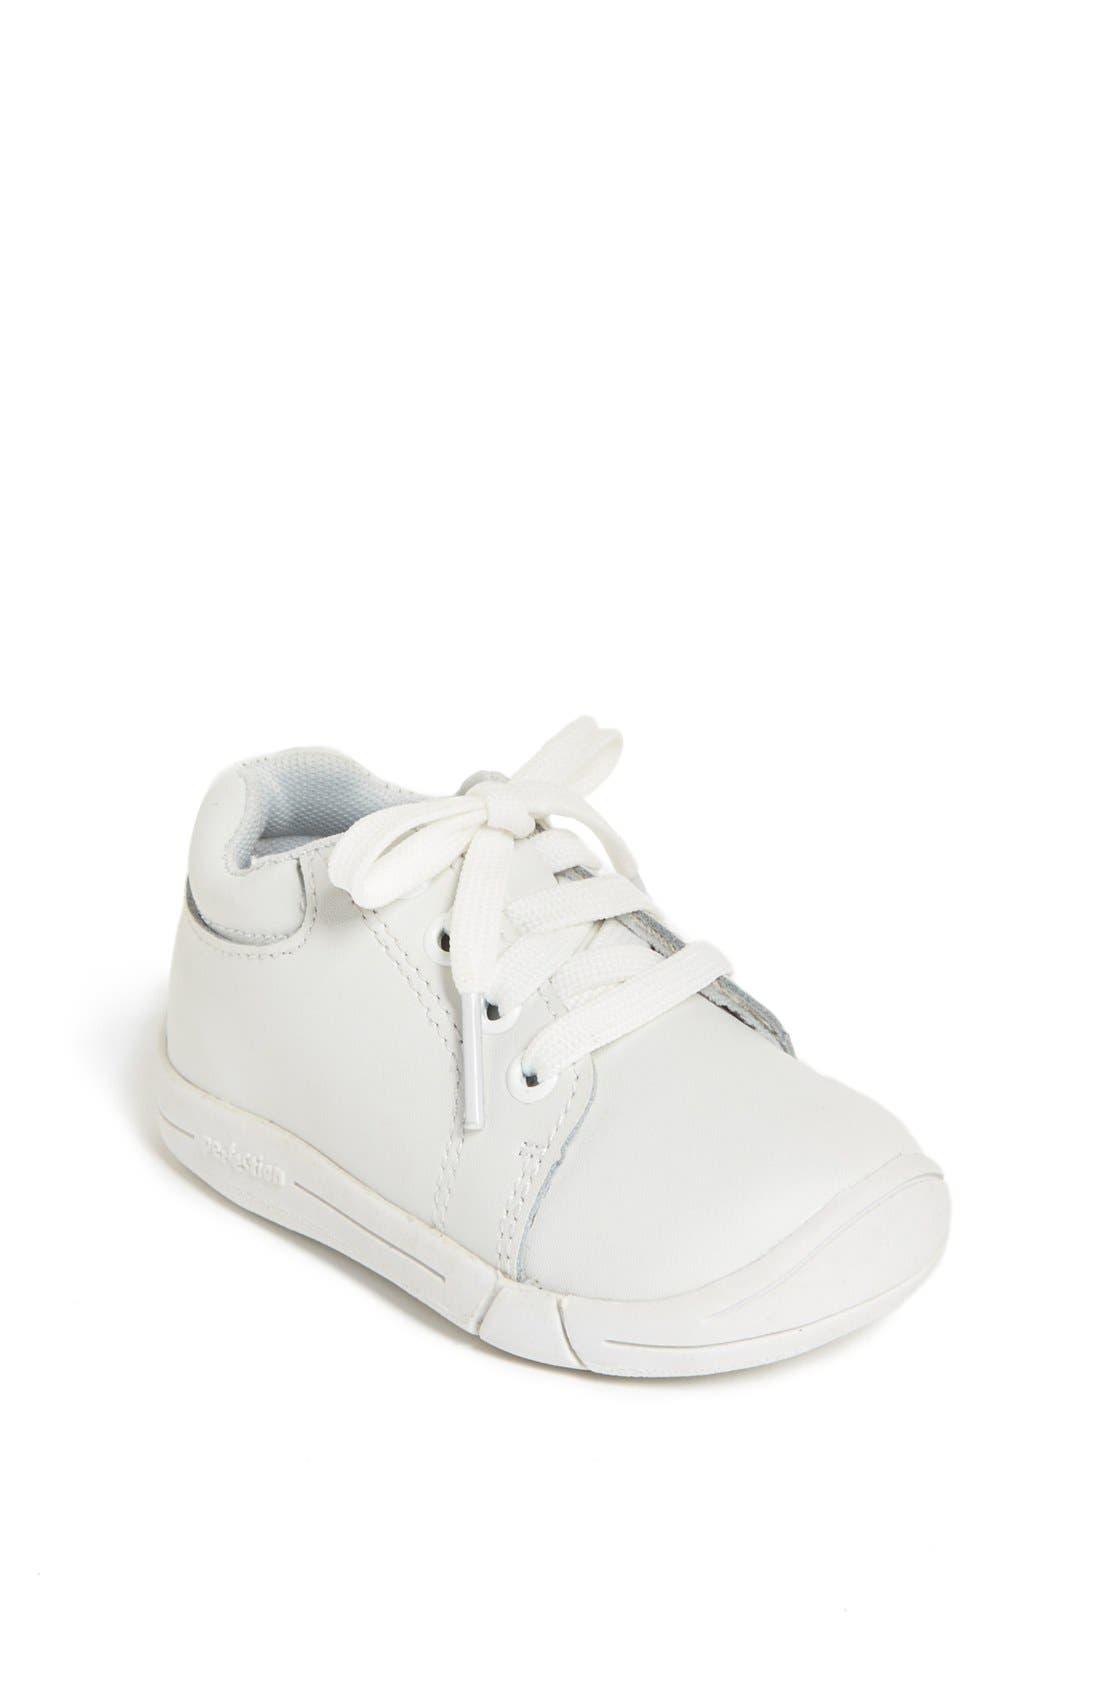 Main Image - Jumping Jacks 'Perfection' Sneaker (Baby, Walker & Toddler)